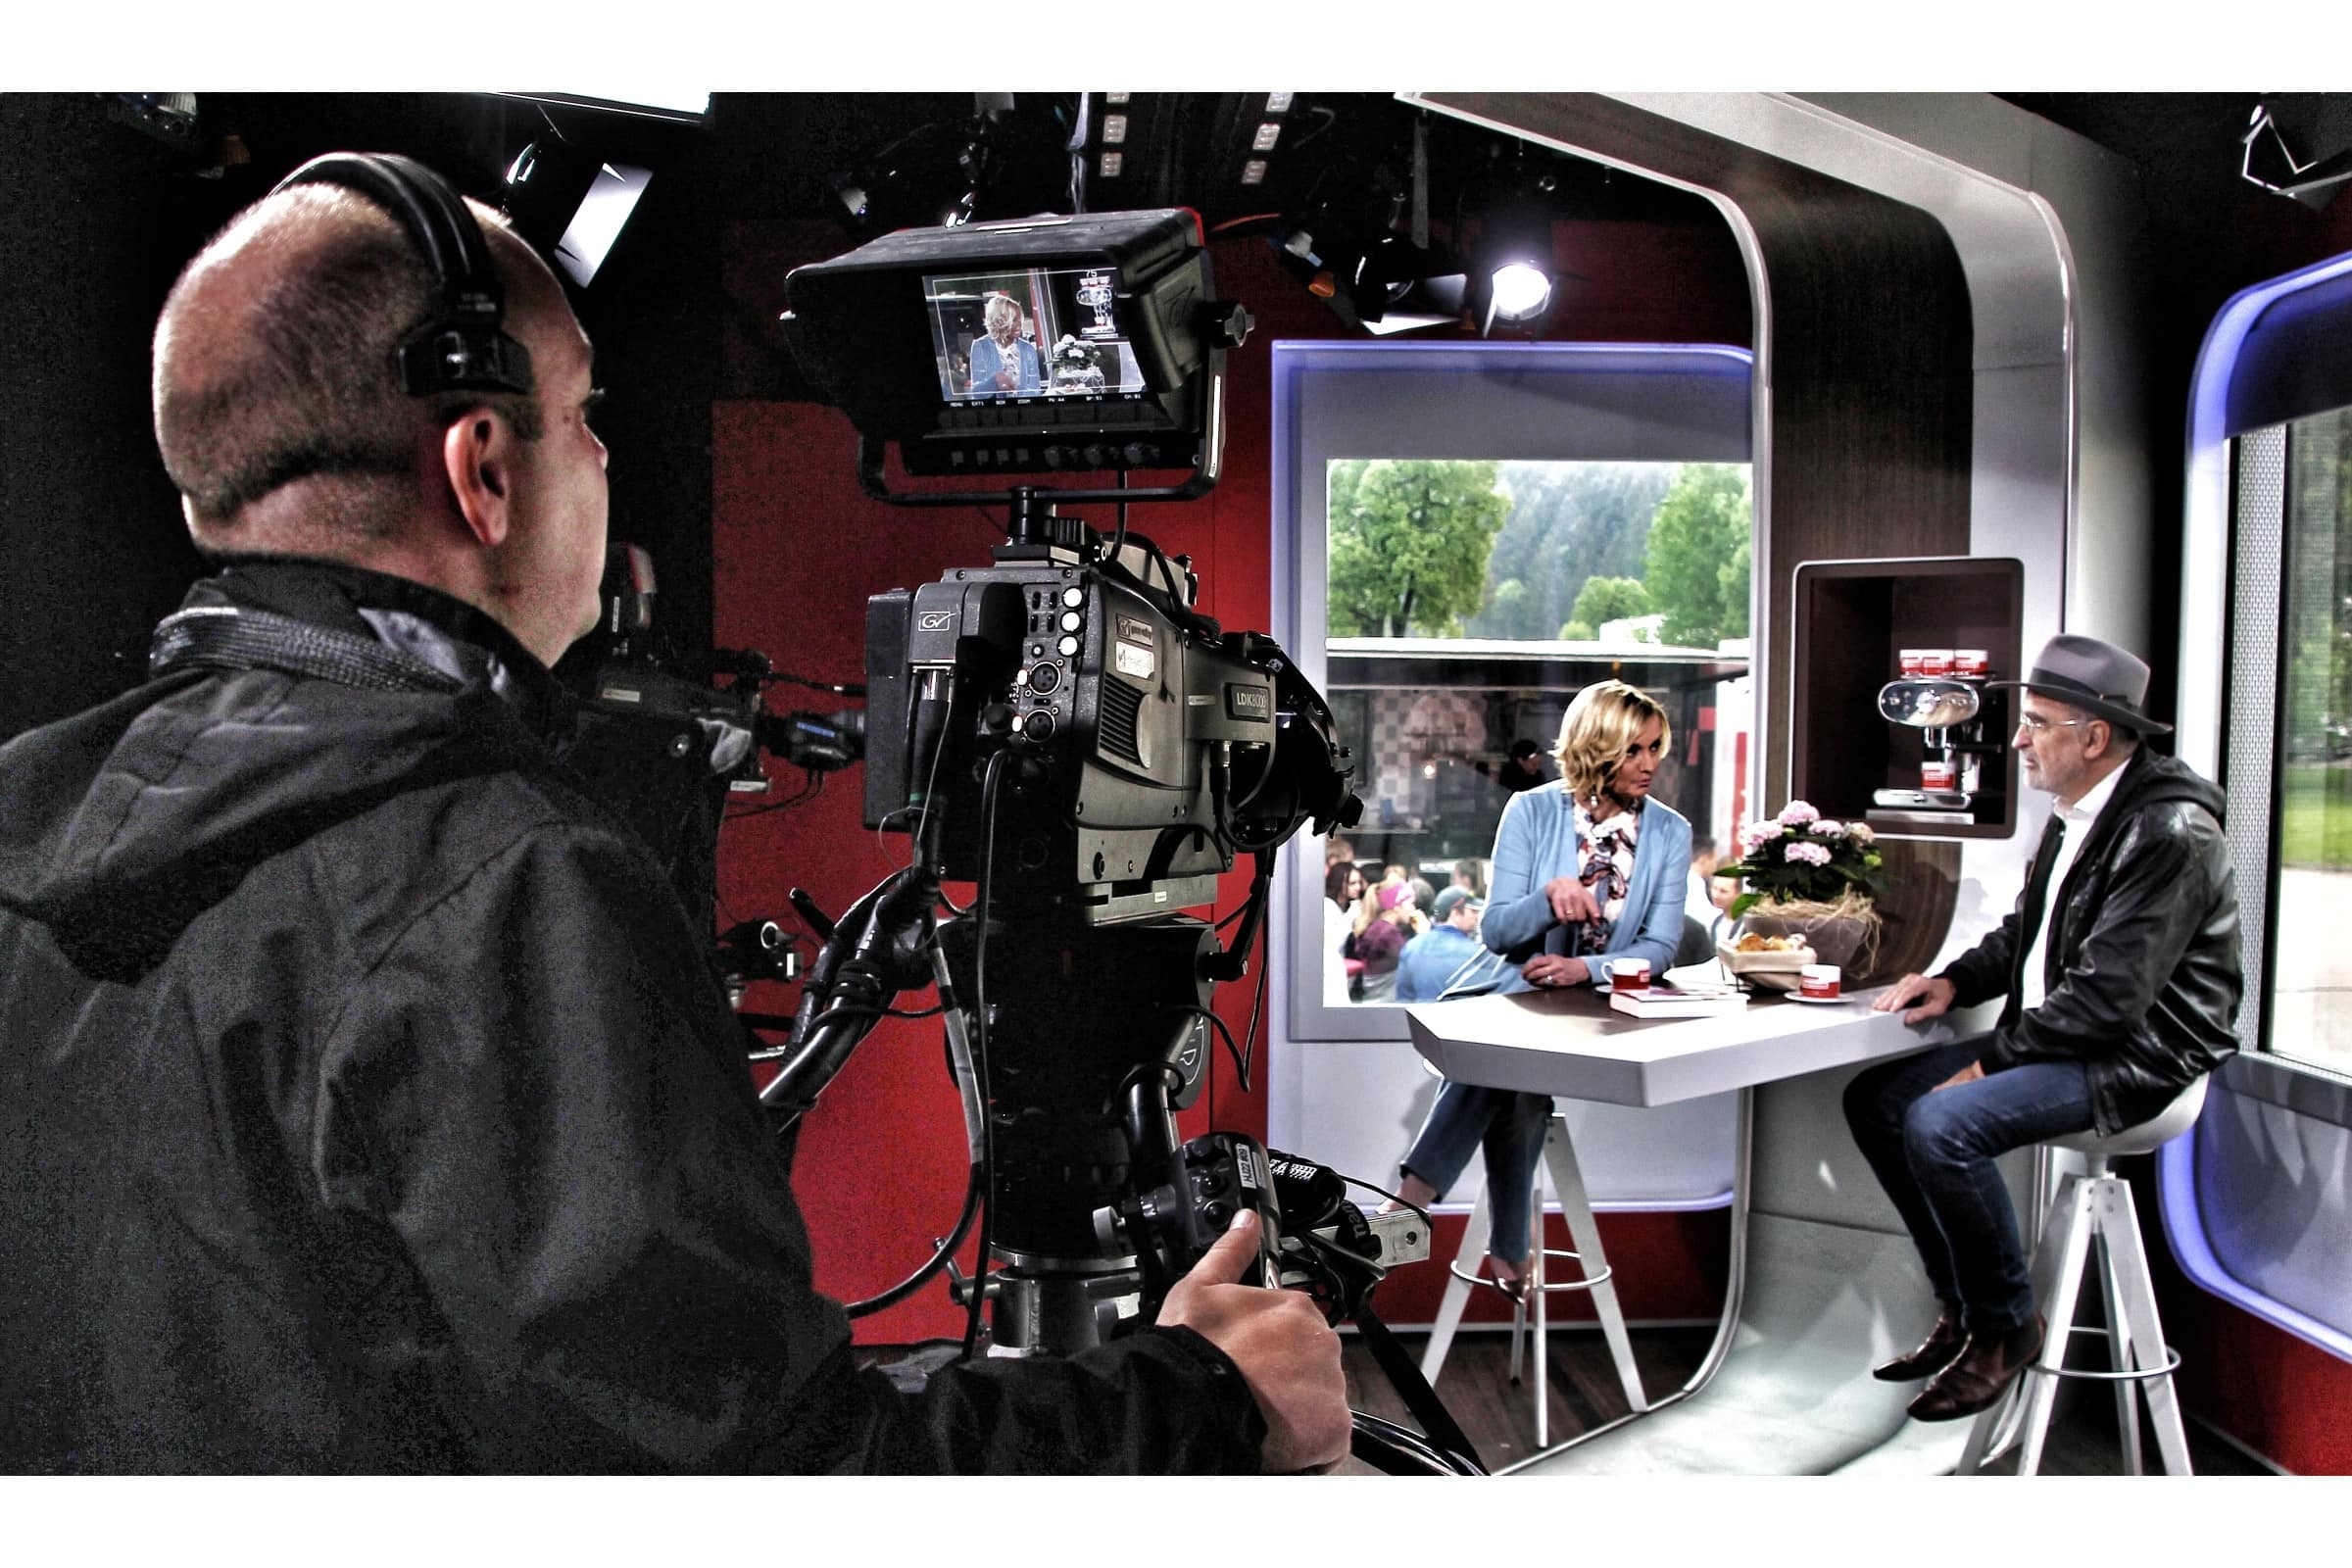 andreas felder kameramann orf unterwegs in österreich 21 02.05.2018 08 59 20 - ORF Unterwegs in Österreich - Tirol